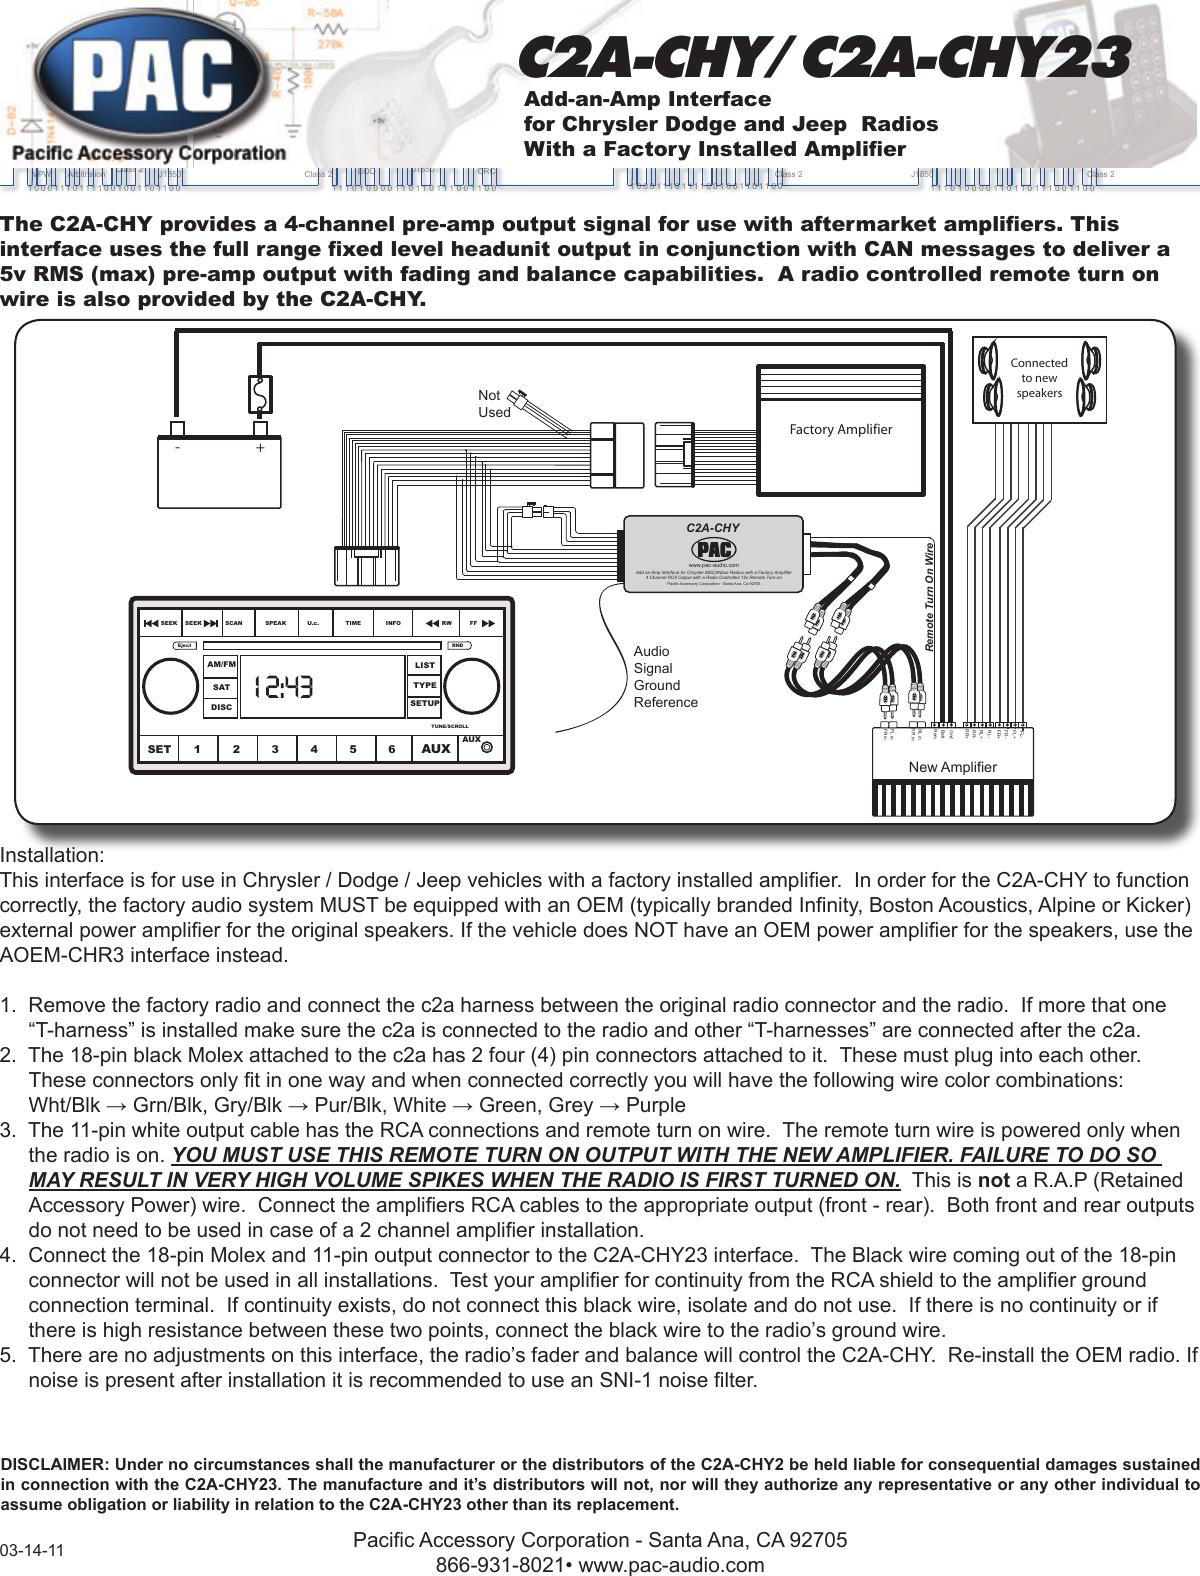 Azgm11 Pac Wiring Diagram Manual Guide